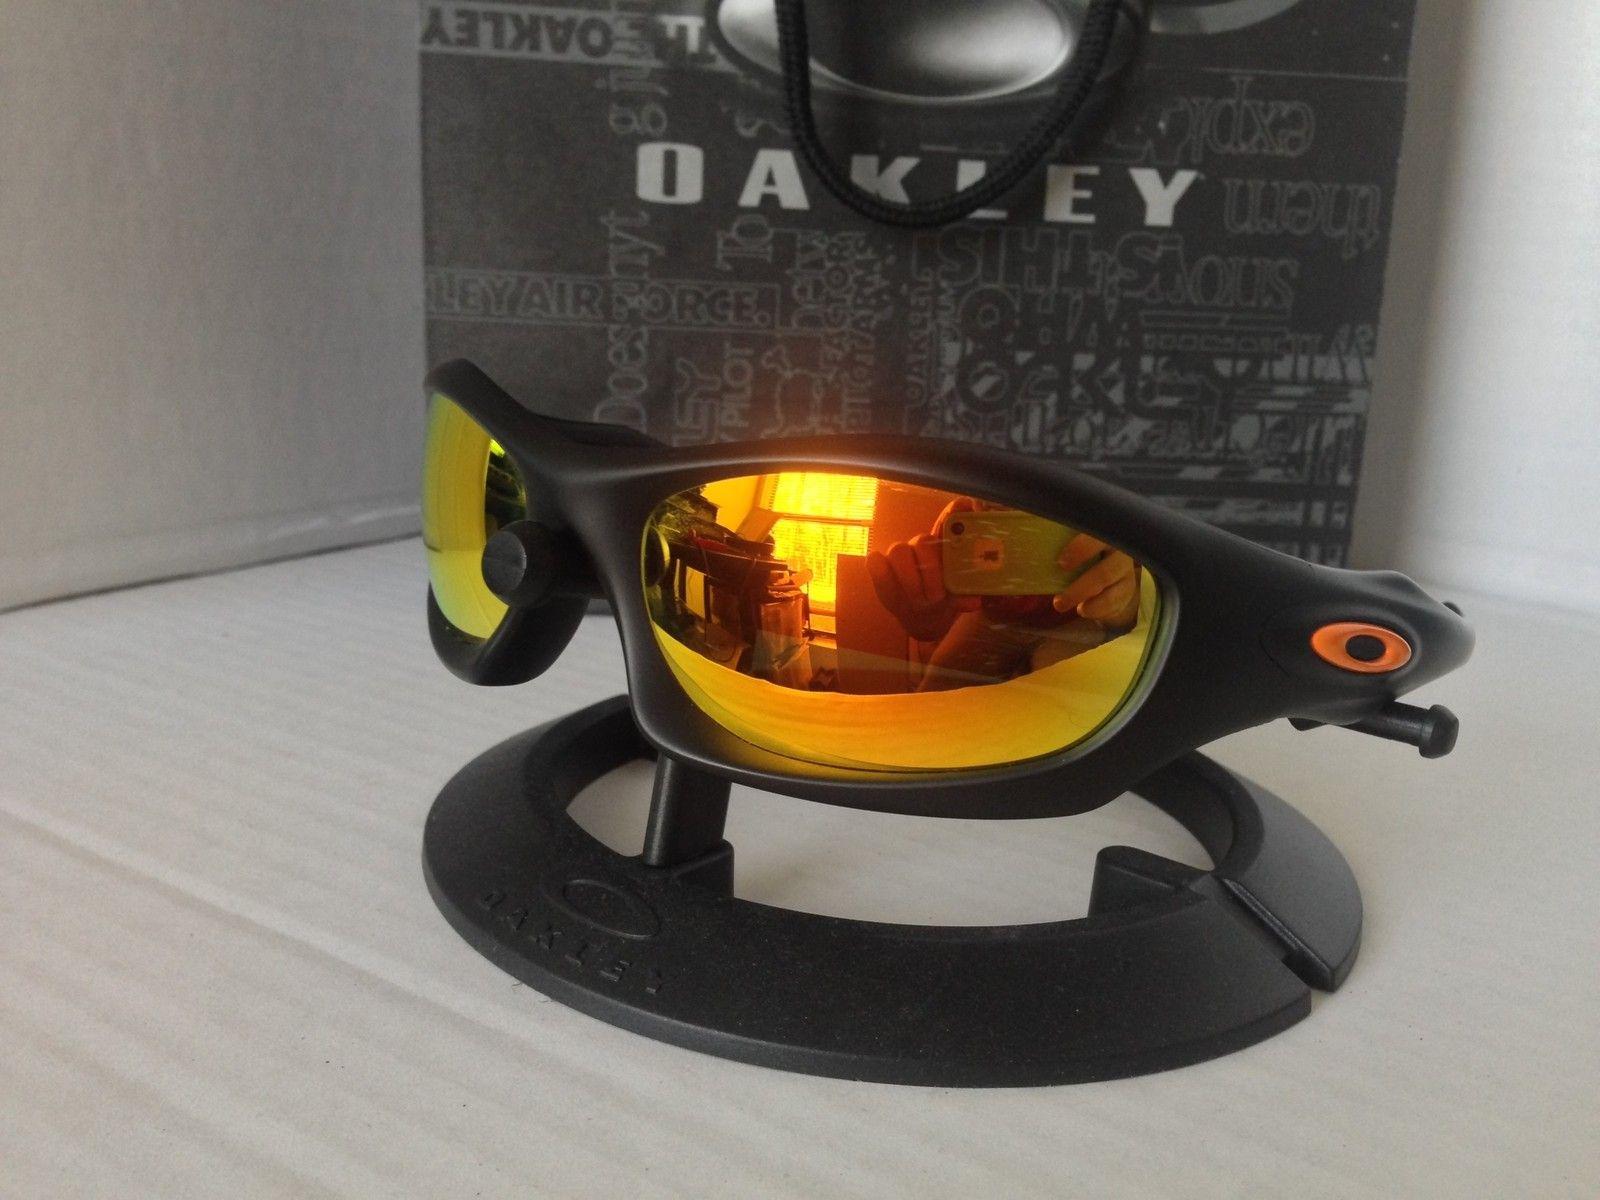 [SOLD]Monster Dog Matte Black/Fire Iri/ Orange Icons $85FF - ZqJ9Wwf.jpg